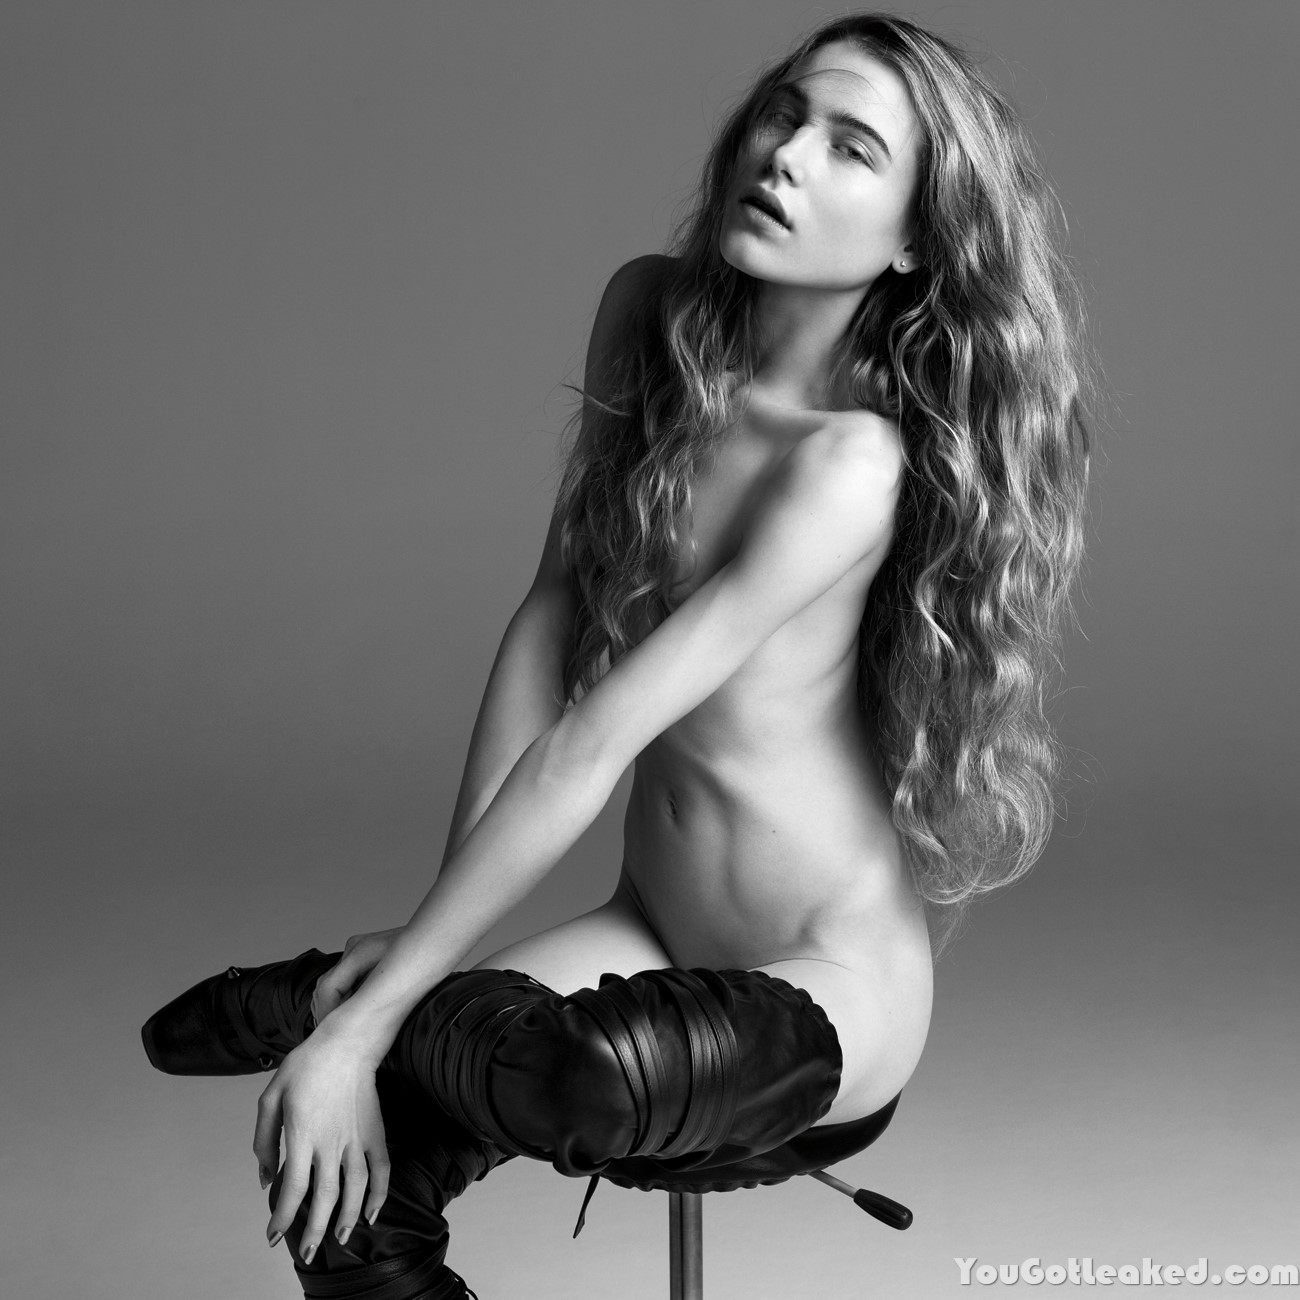 Dree Hemingway Topless Ph...